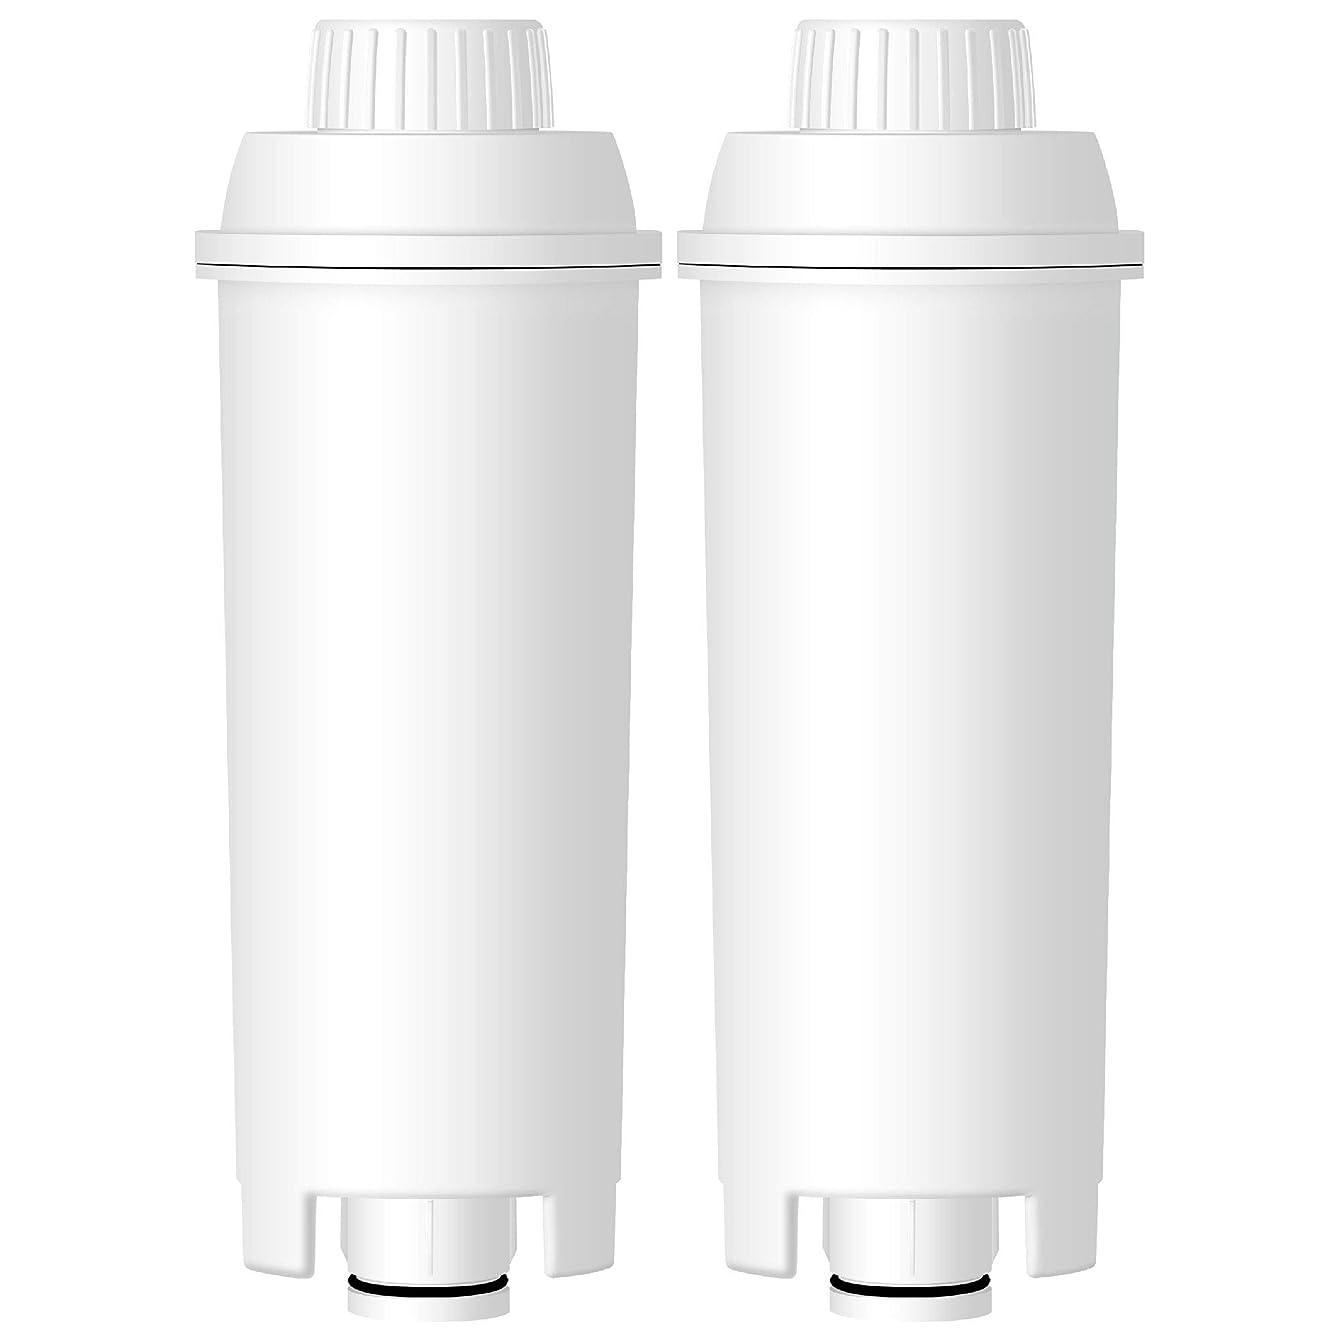 AQUA CREST TüV SüD Certified DLS C002 Coffee Water Filter, Compatible with DELONGHI De'Longhi DLS C002 (Pack of 2)